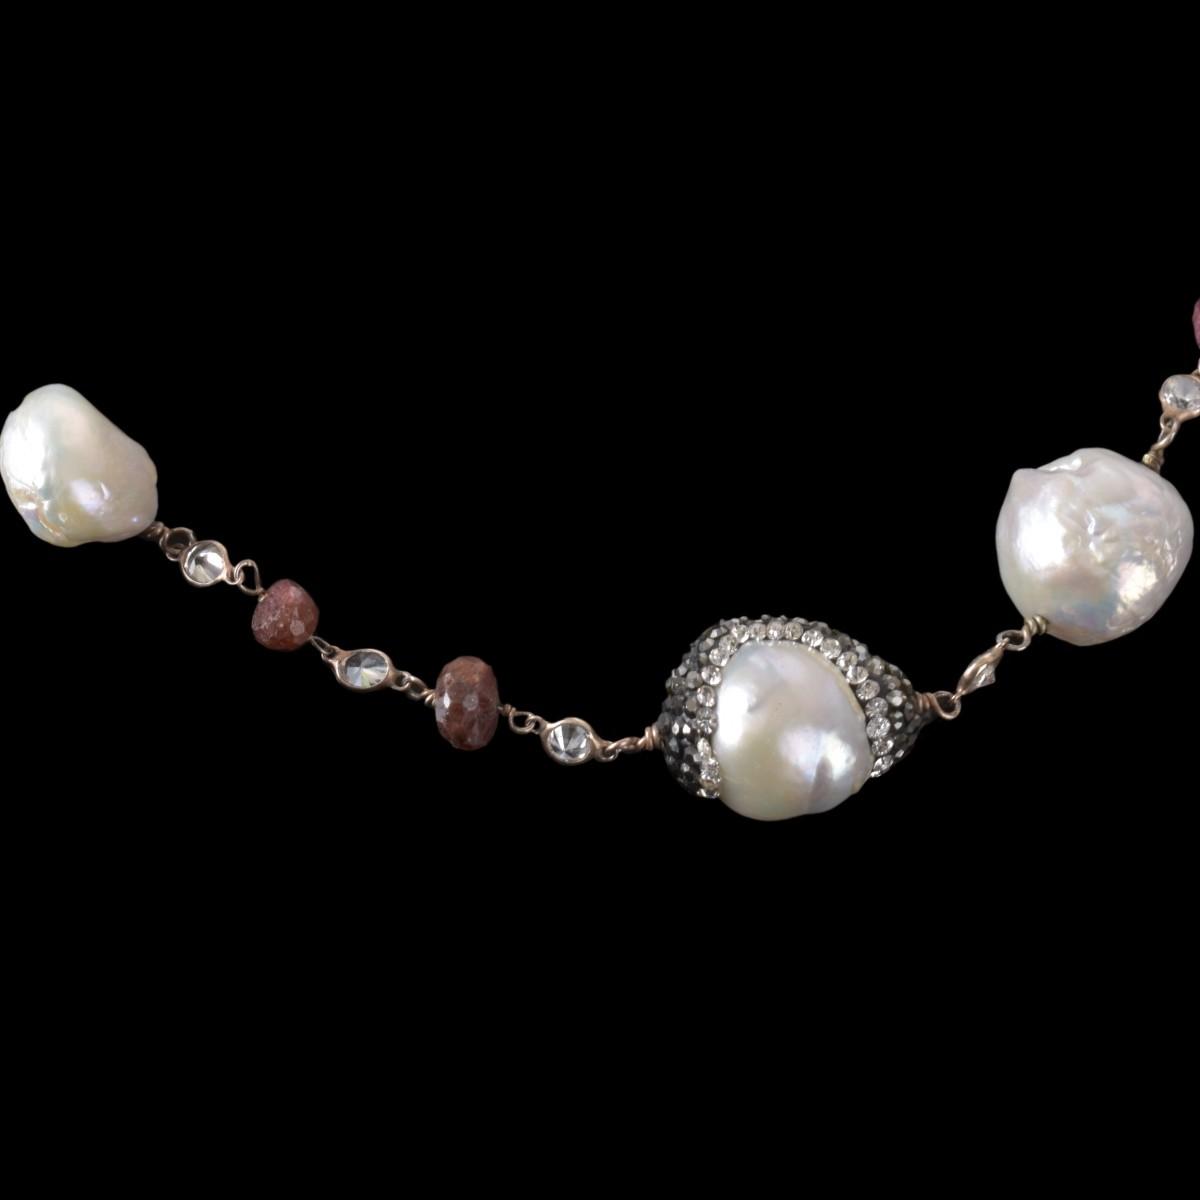 Lot 135 - Vintage Indian Baroque Pearl Necklace